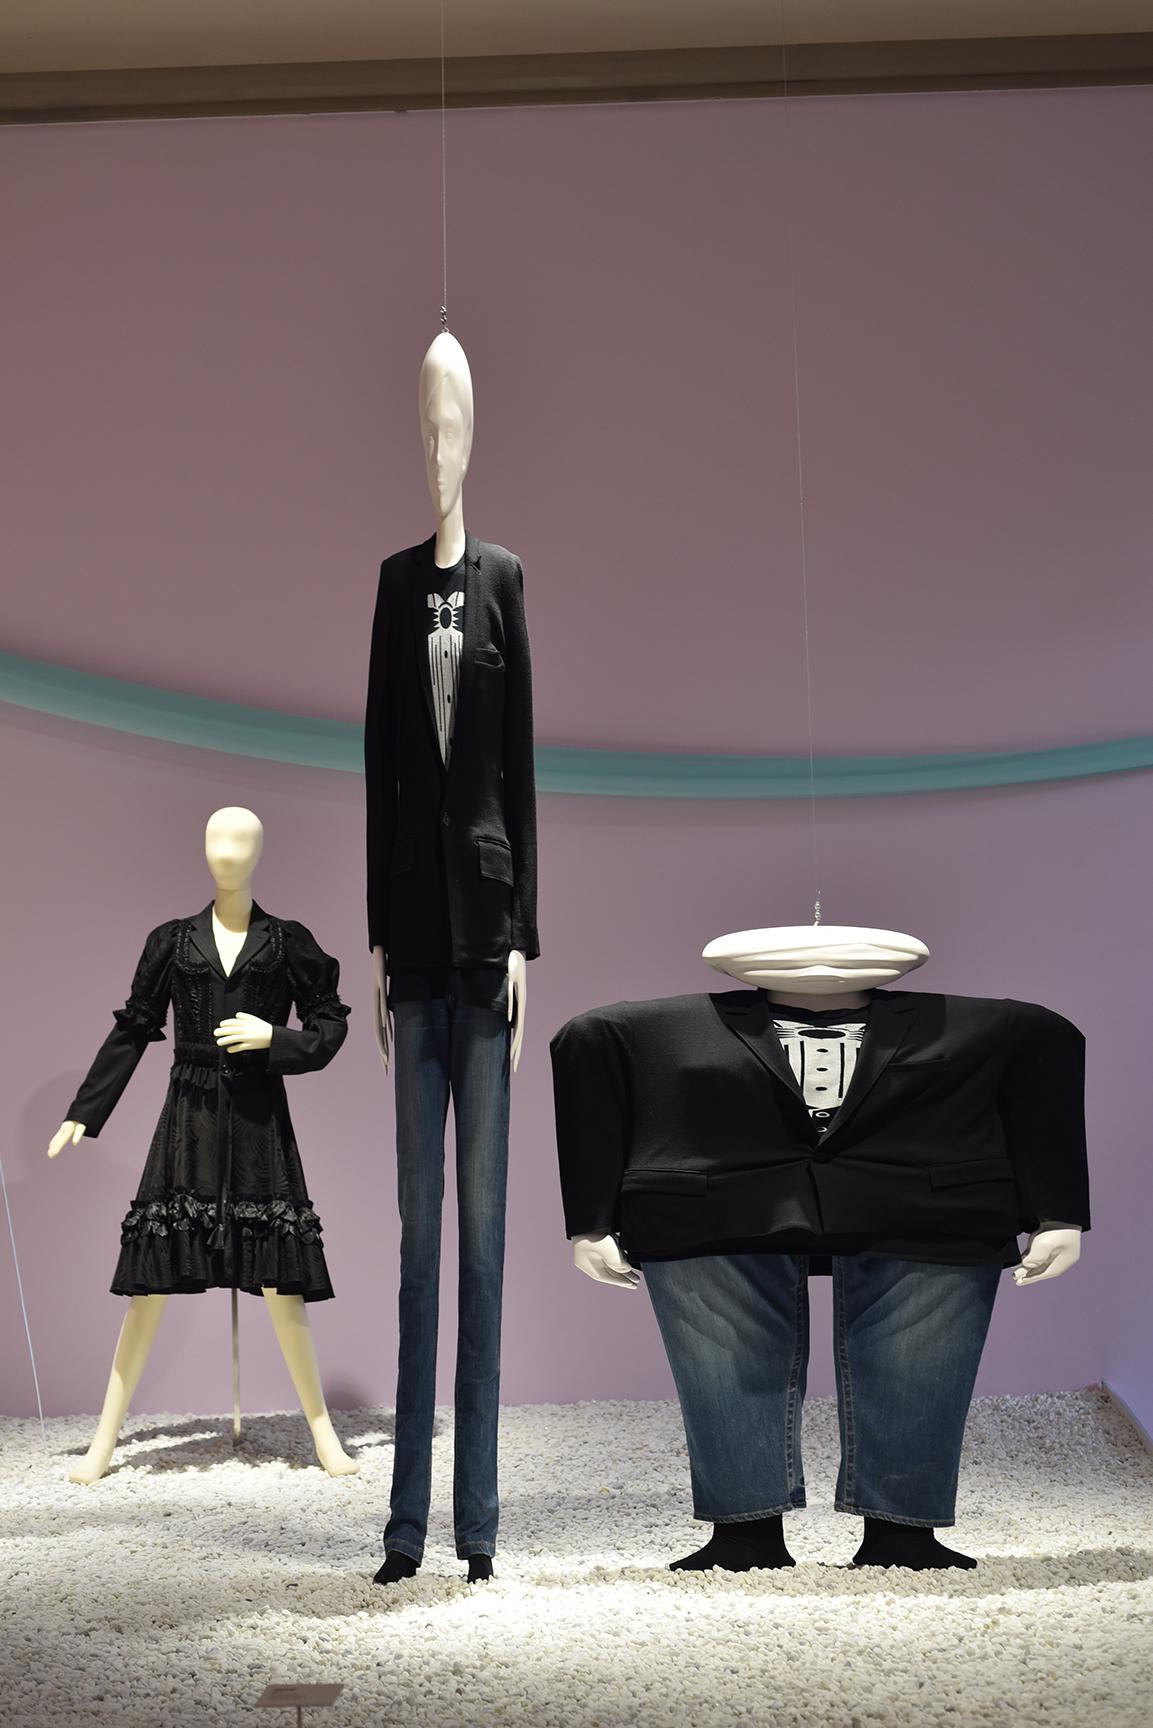 27-Utopian-Bodies-Fashion-Looks-Forward-Liljevalchs-Resistance-and-Beauty-Comme-des-Garcons-for-HM-2-x-Anrealage-Photo-Mattias-Lindback.jpg